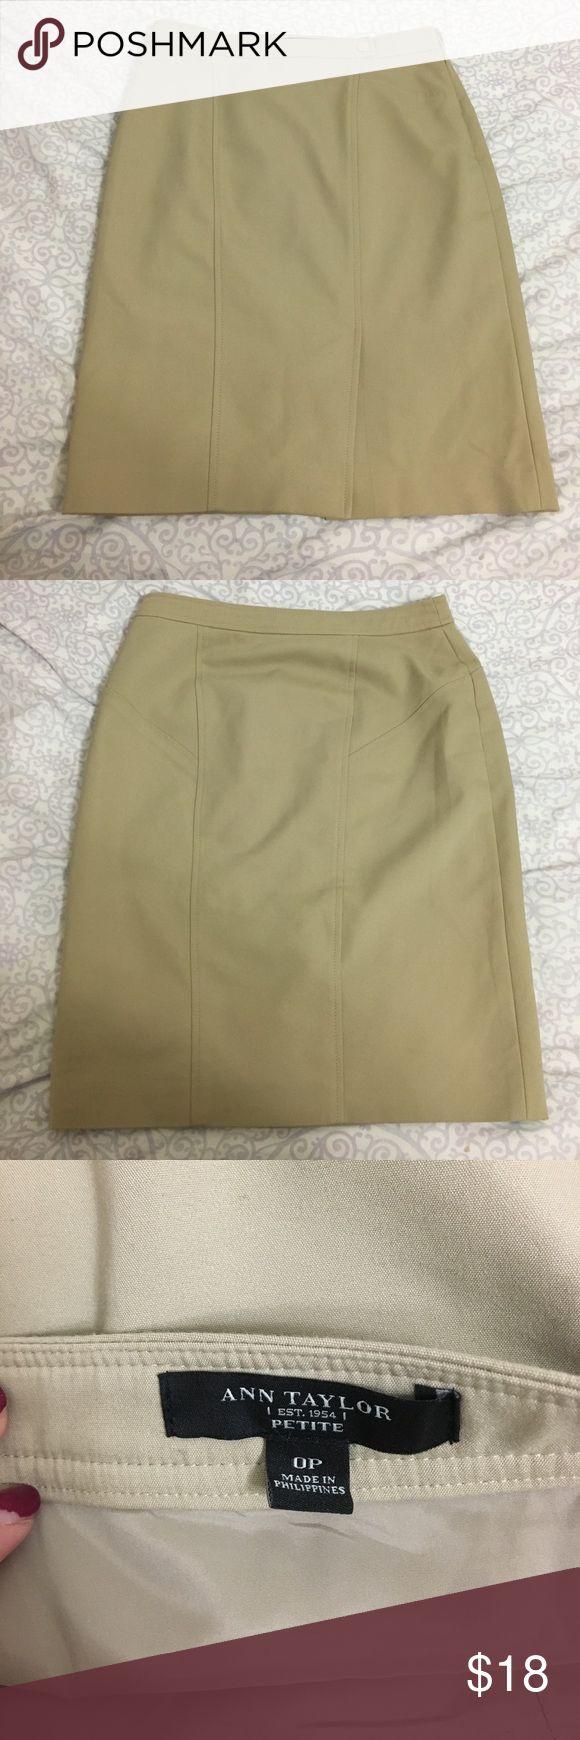 Ann Taylor petite pencil skirt Pencil skirt petite 0. Side zipper. Cute snap detail on waist. Barely worn Ann Taylor Skirts Pencil